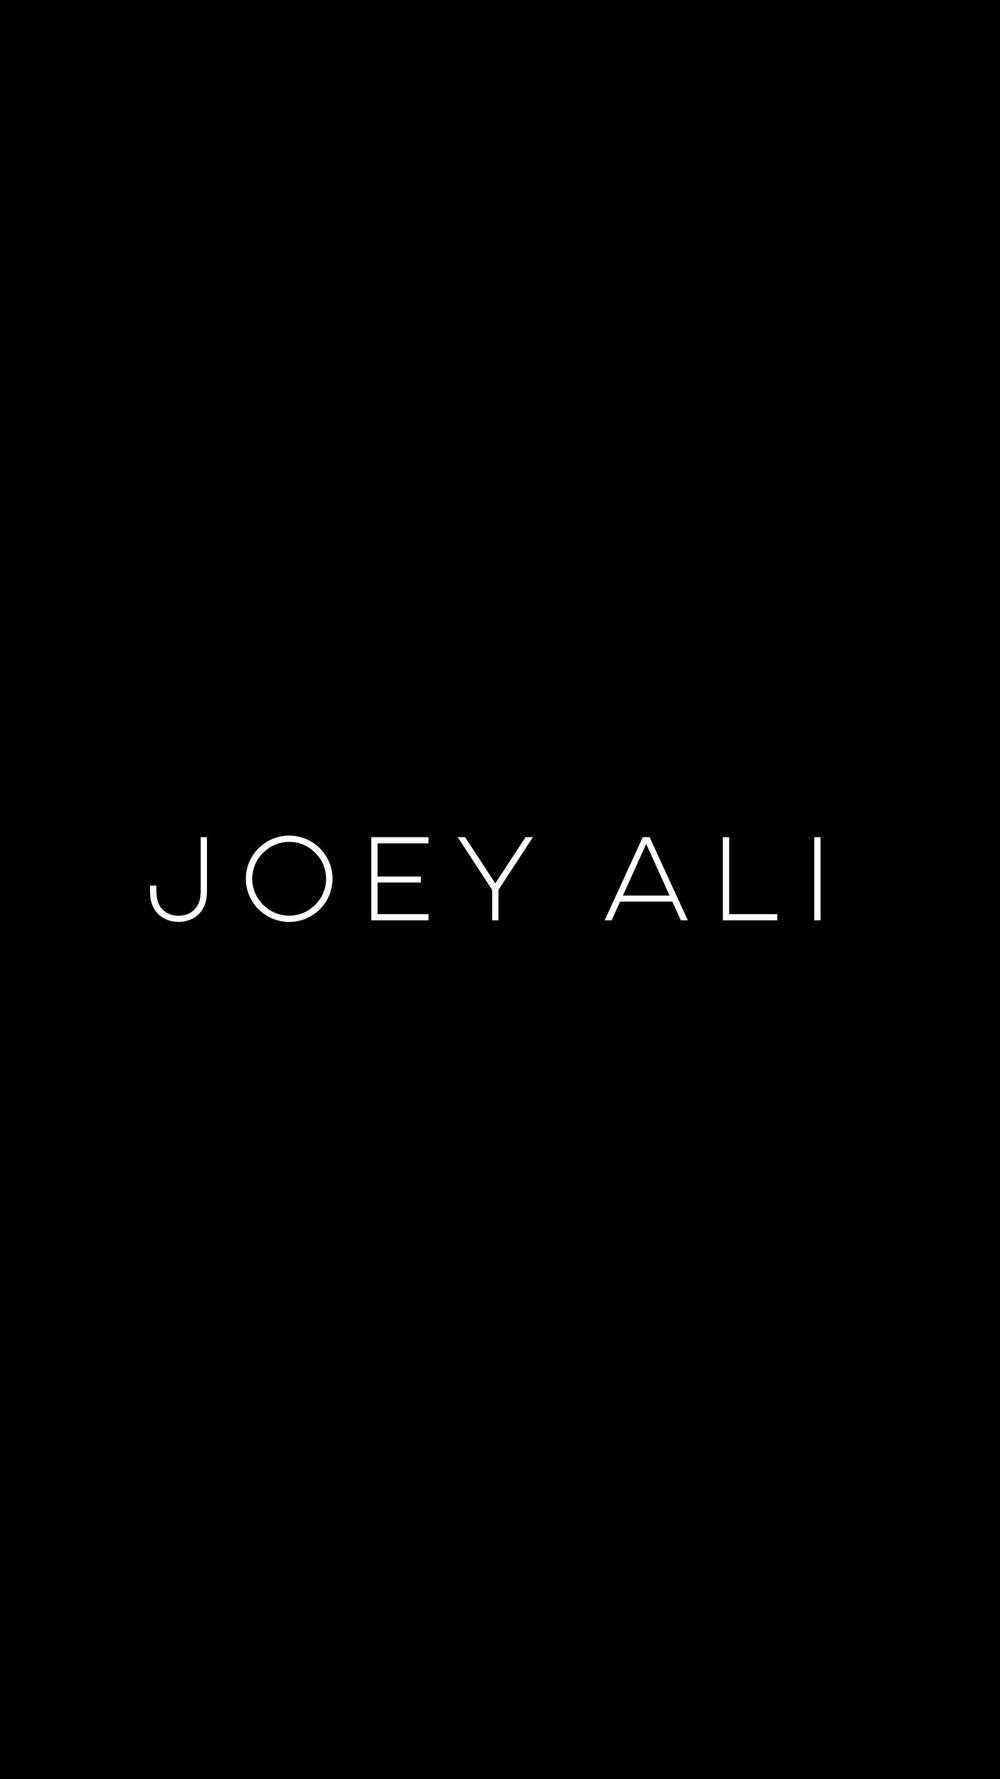 JOEY ALI.jpg